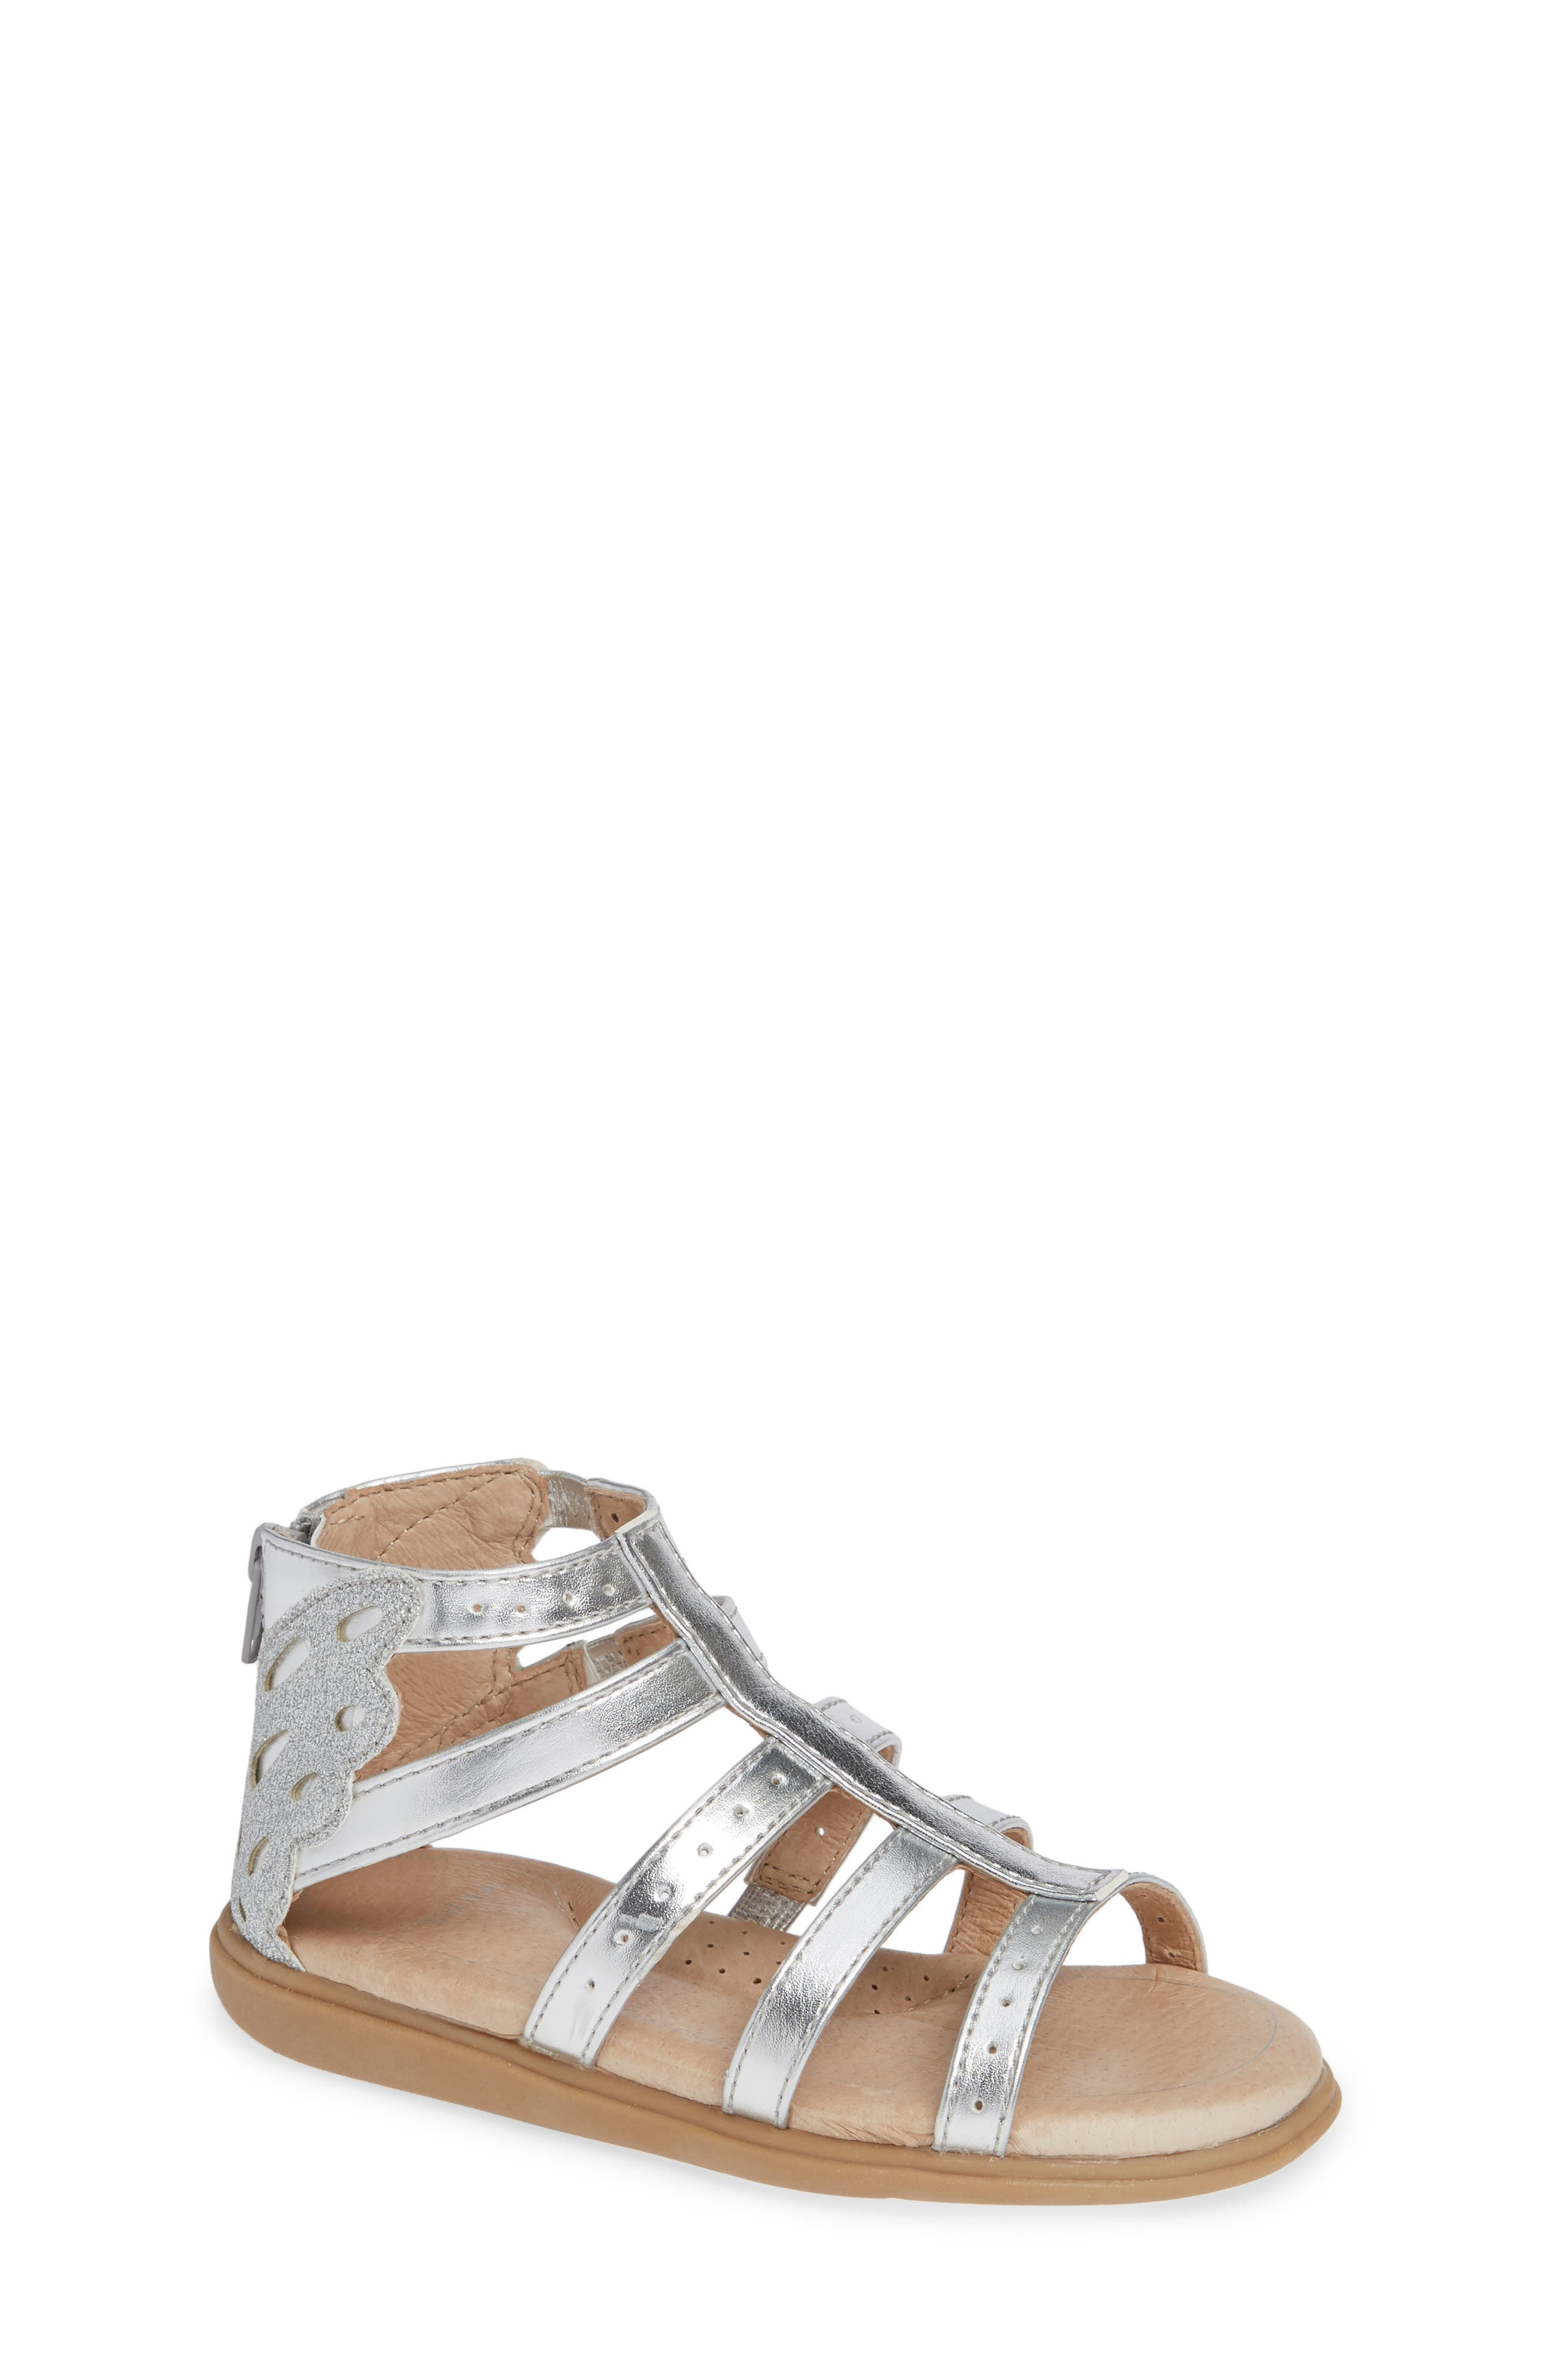 SOLE PLAY, Camille Metallic Sandal, Main thumbnail 1, color, SILVER